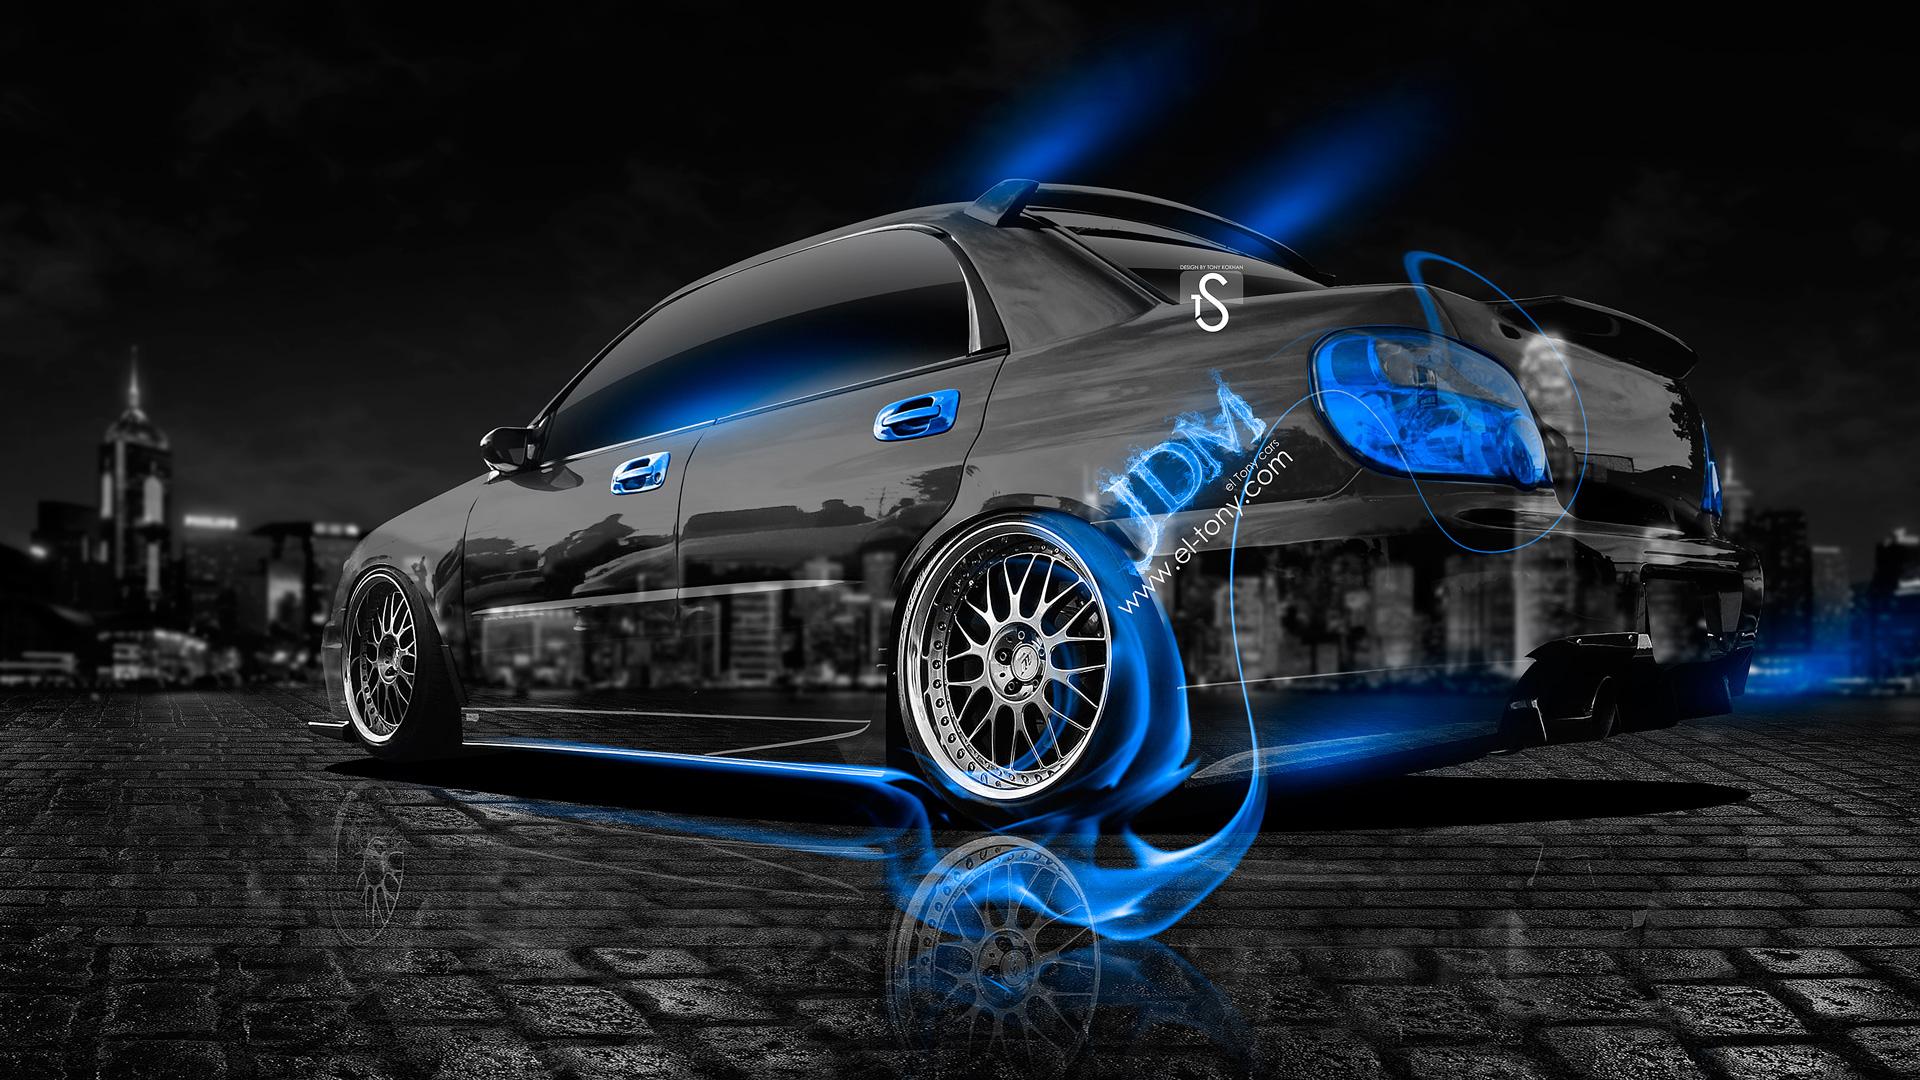 Free Download Jdm Subaru Impreza Wrx Sti 4126x2317 Wallpaper